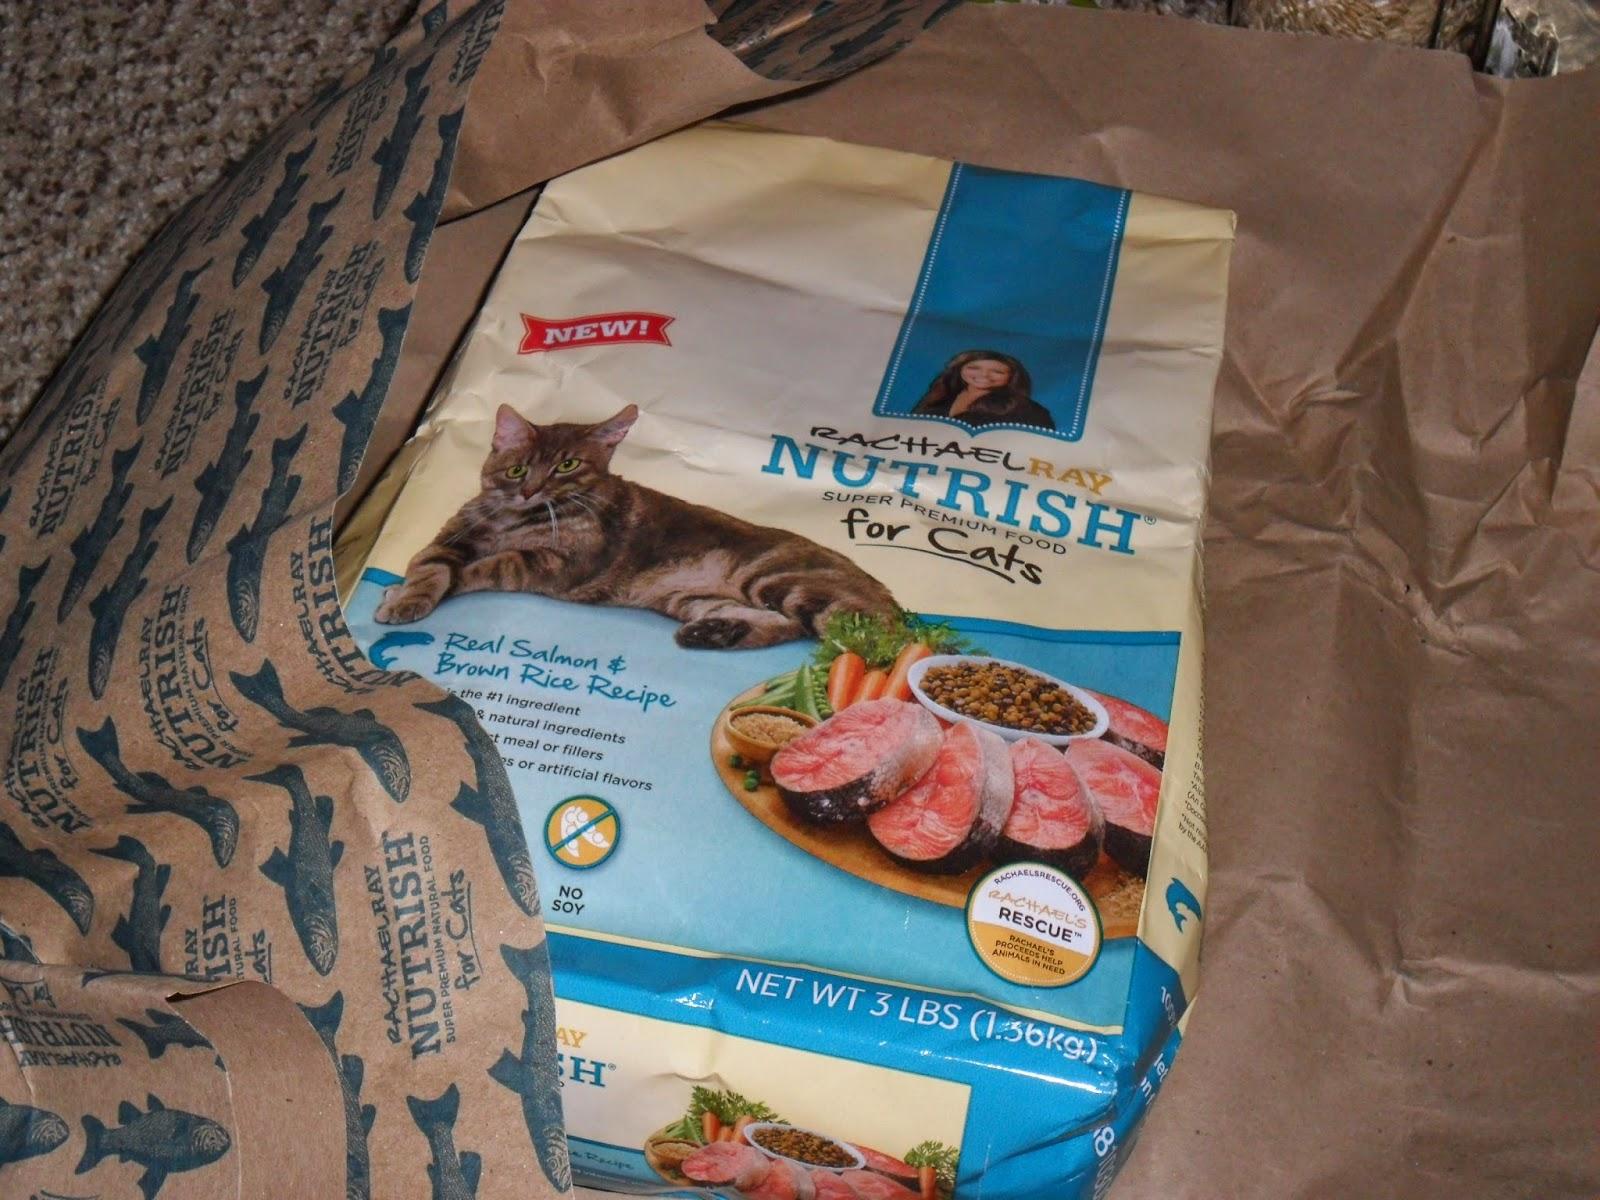 My best furfriend Kami #Sponsored, #MC, and #NutrishforCats #BFF Review & Giveaway